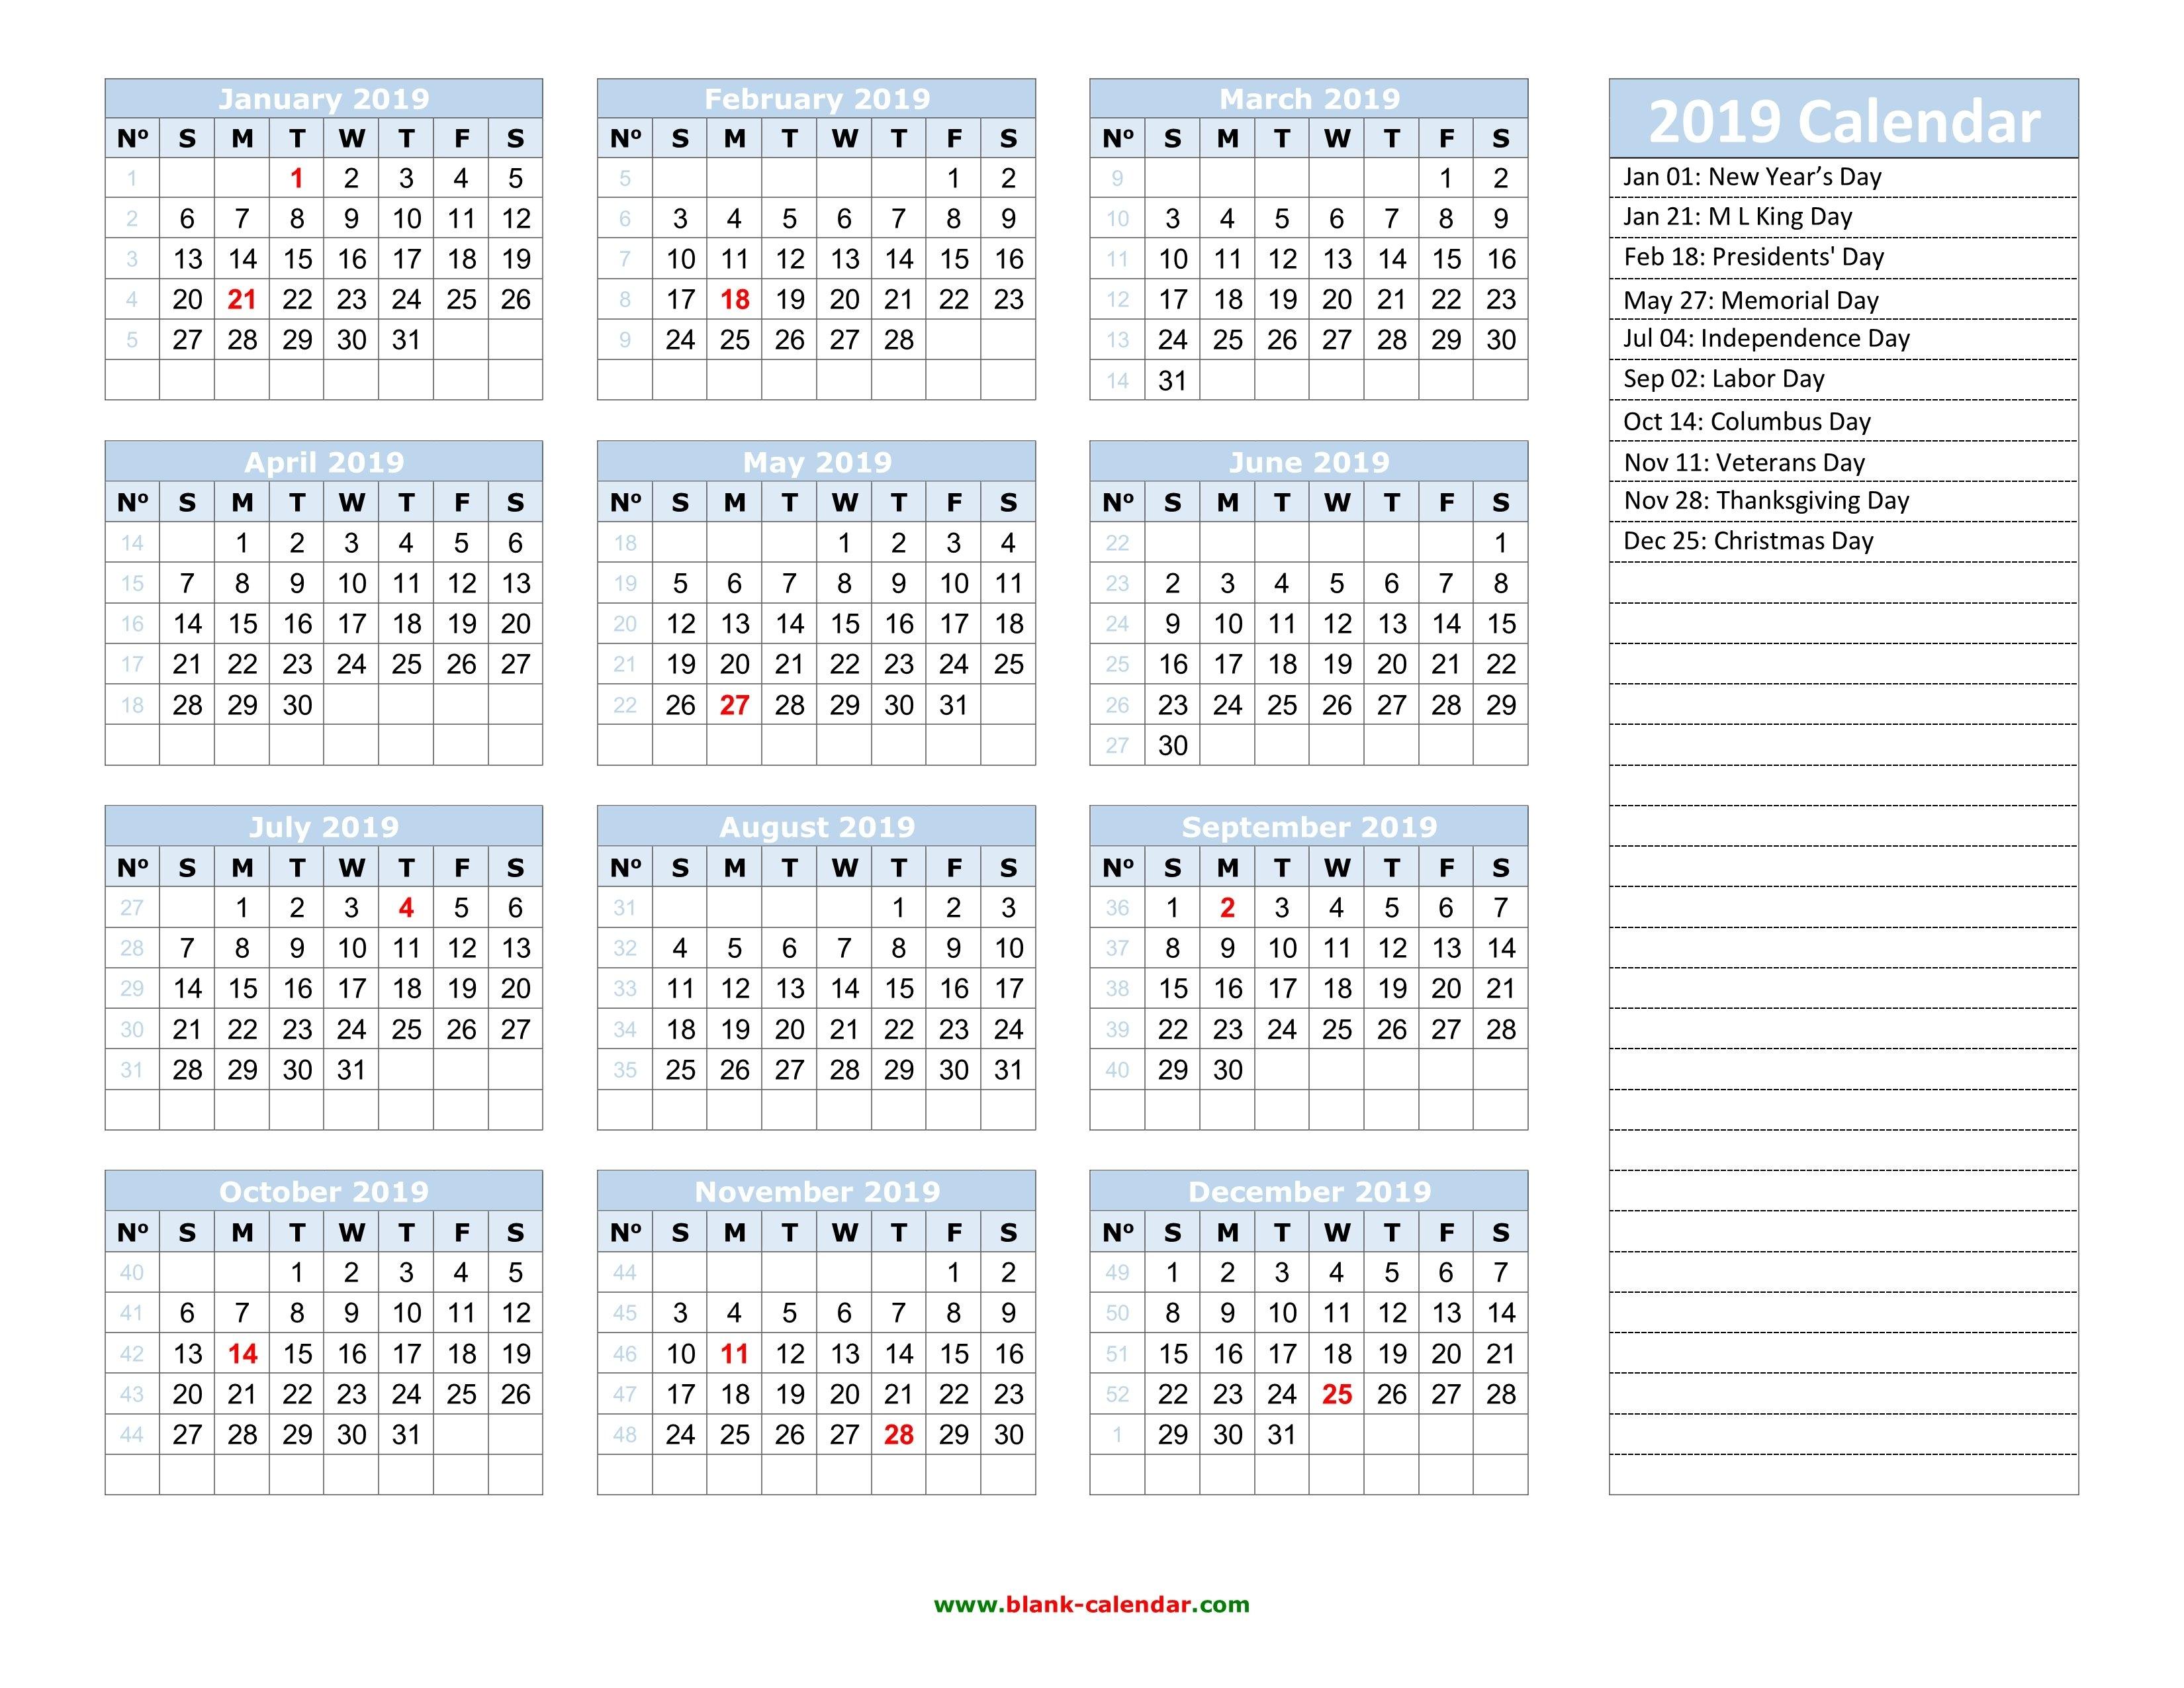 Yearly Calendar 2019 | Free Download And Print Calendar Week 50 2019